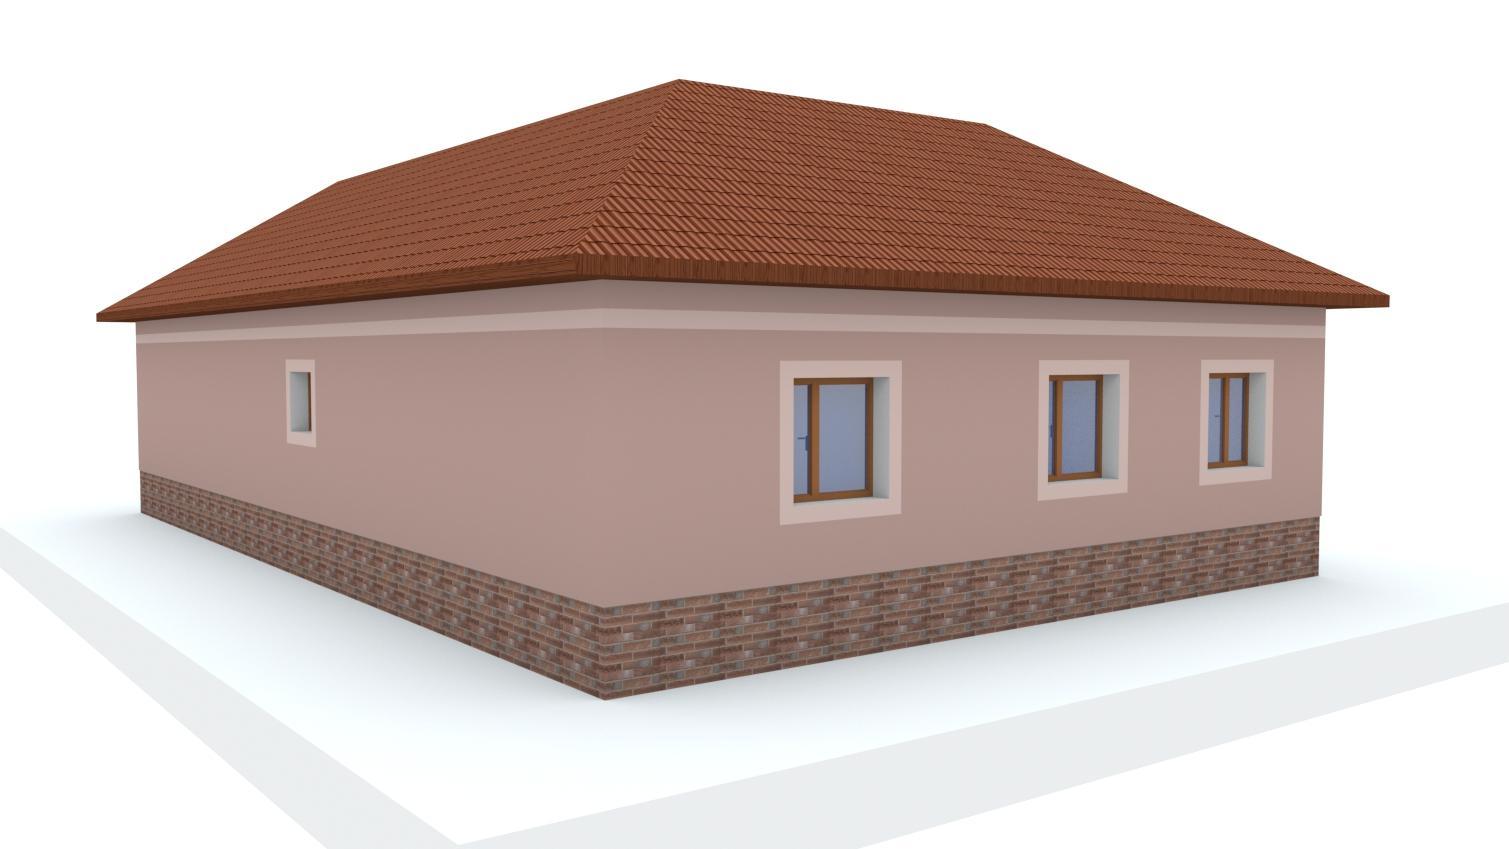 Návrh fasády rodinného domu - Obrázok č. 21